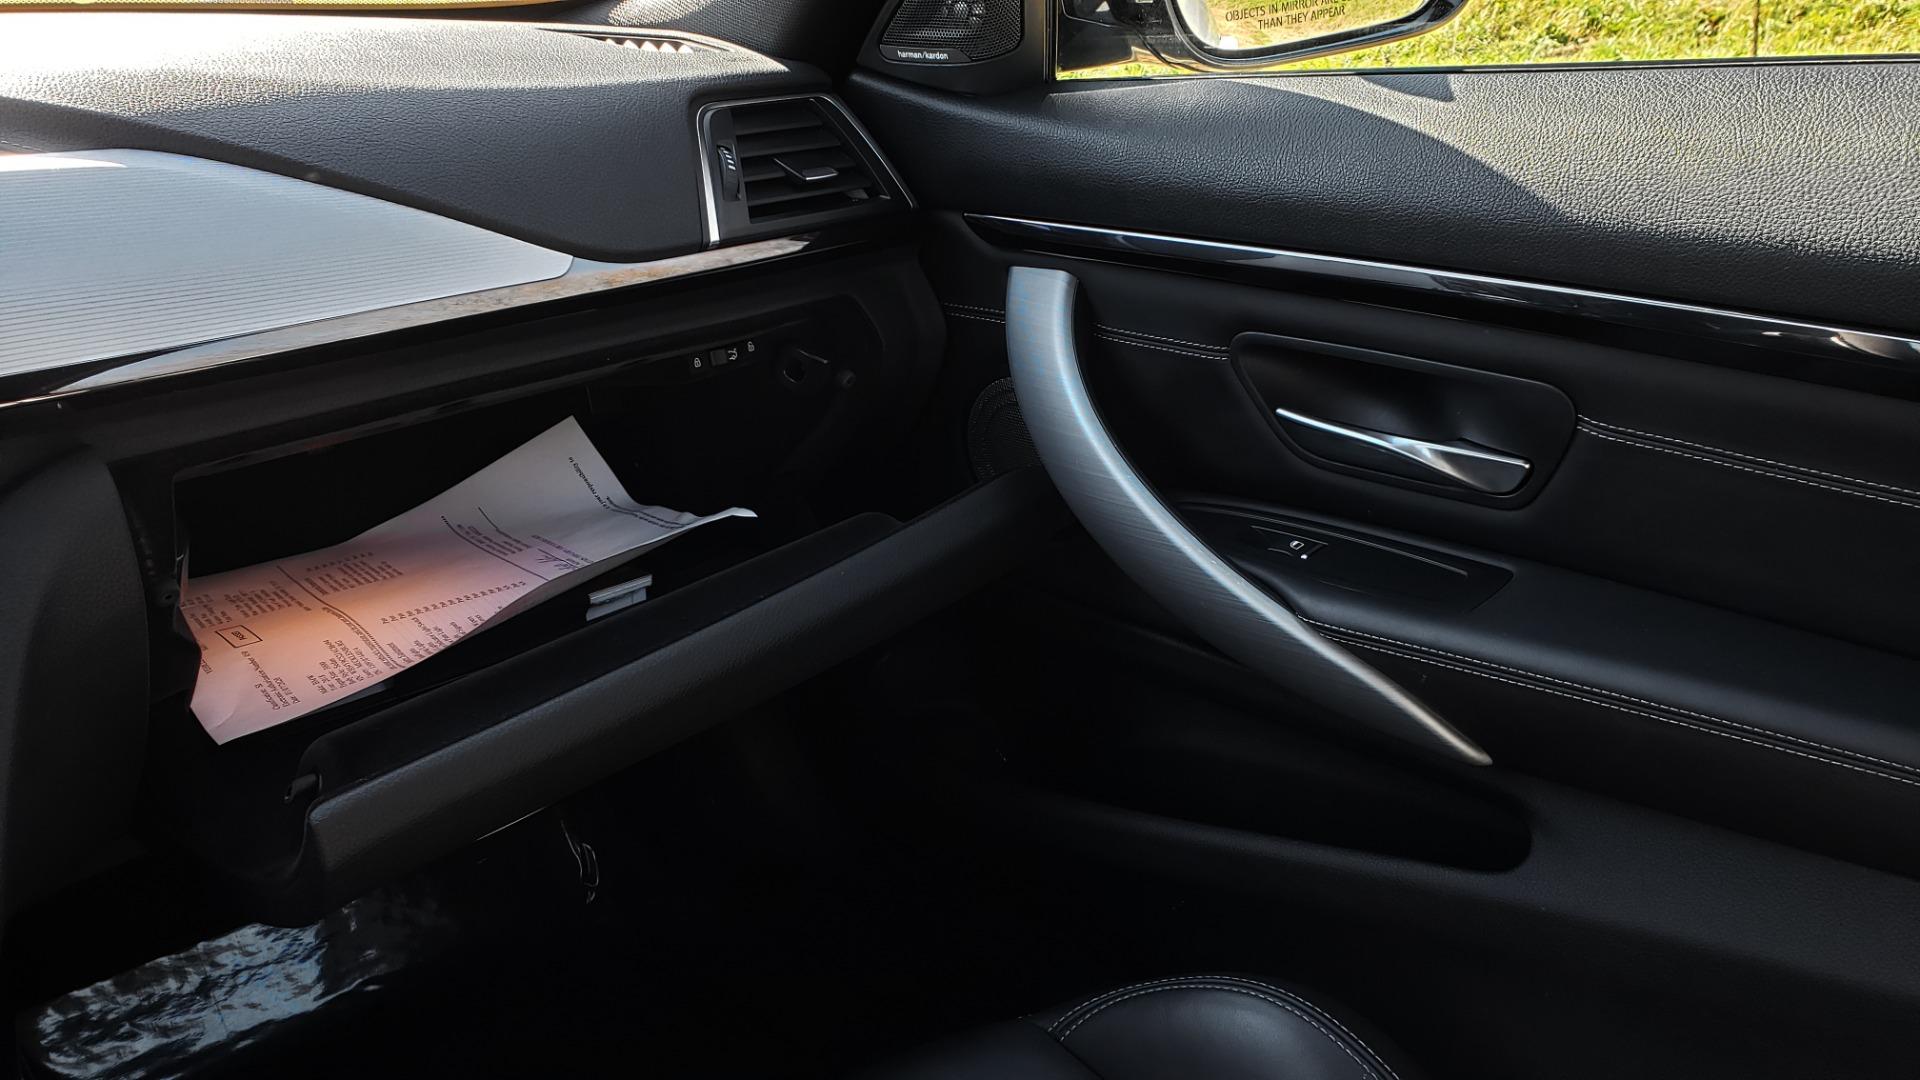 Used 2018 BMW M4 COMP PKG / EXEC / M-DRIVER / PARK CNTRL / ACTIVE BLIND SPOT for sale Sold at Formula Imports in Charlotte NC 28227 54